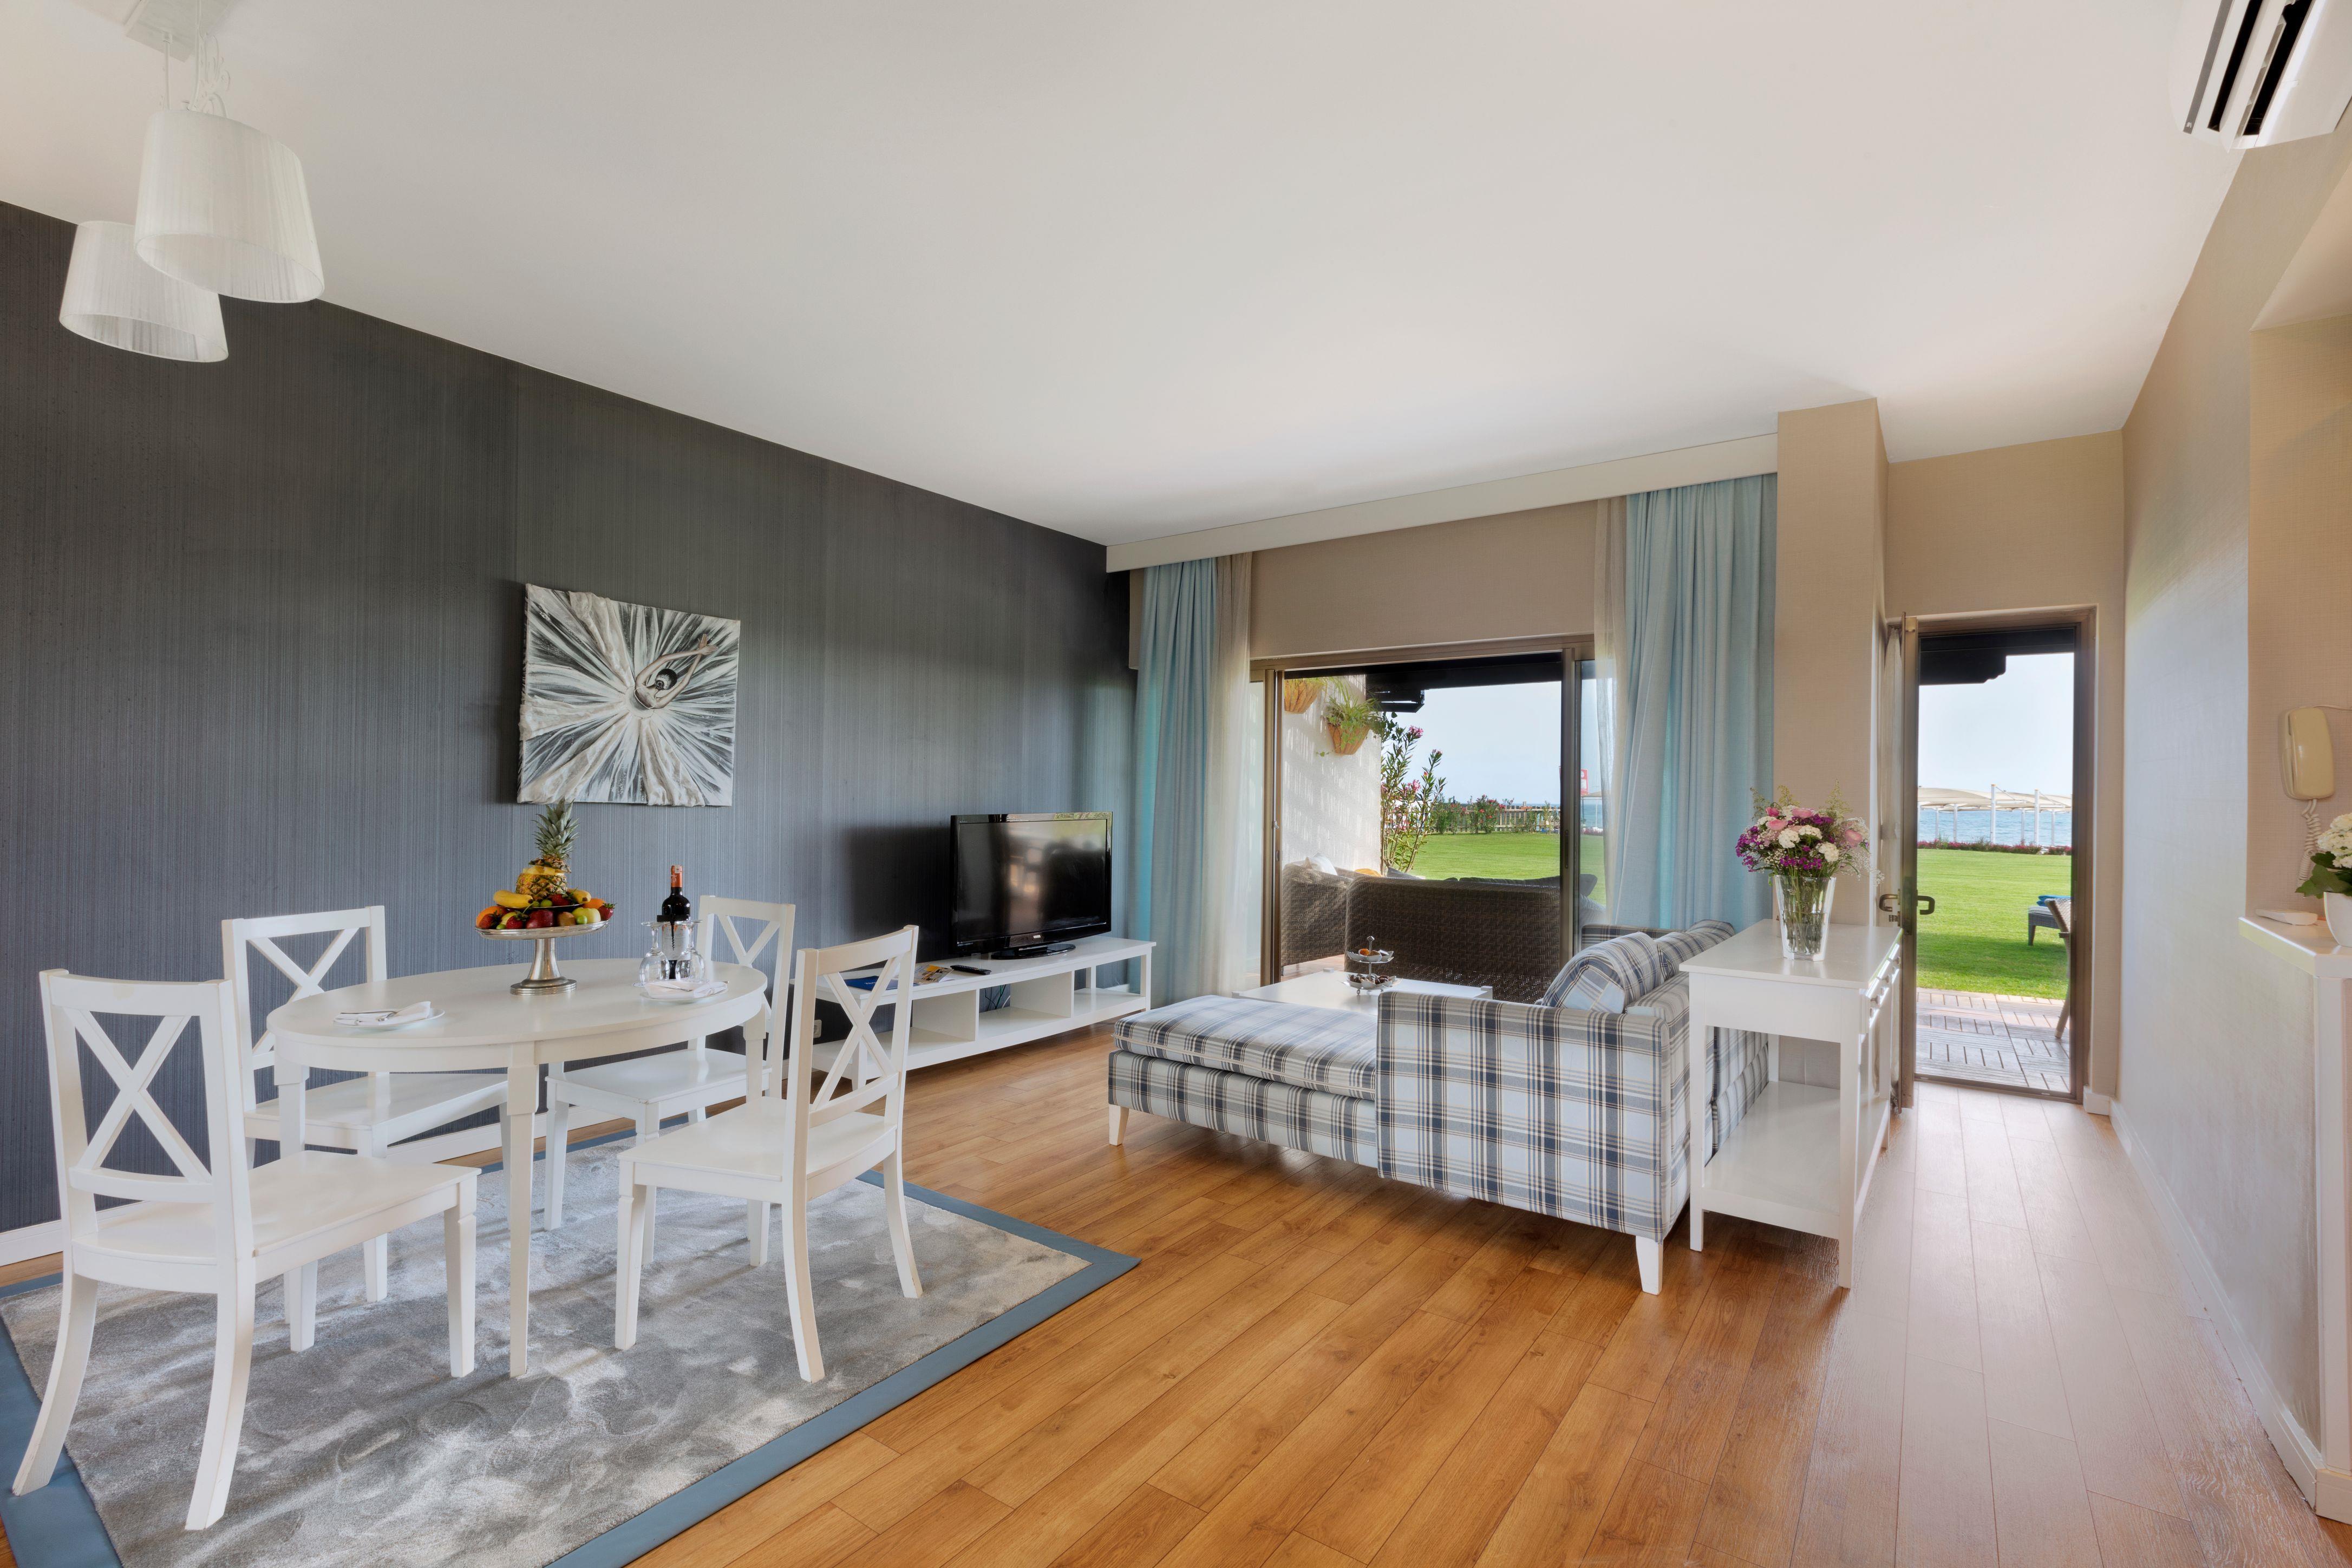 http://www.orextravel.sk/OREX/hotelphotos/zeynep-hotel-general-0028.jpg